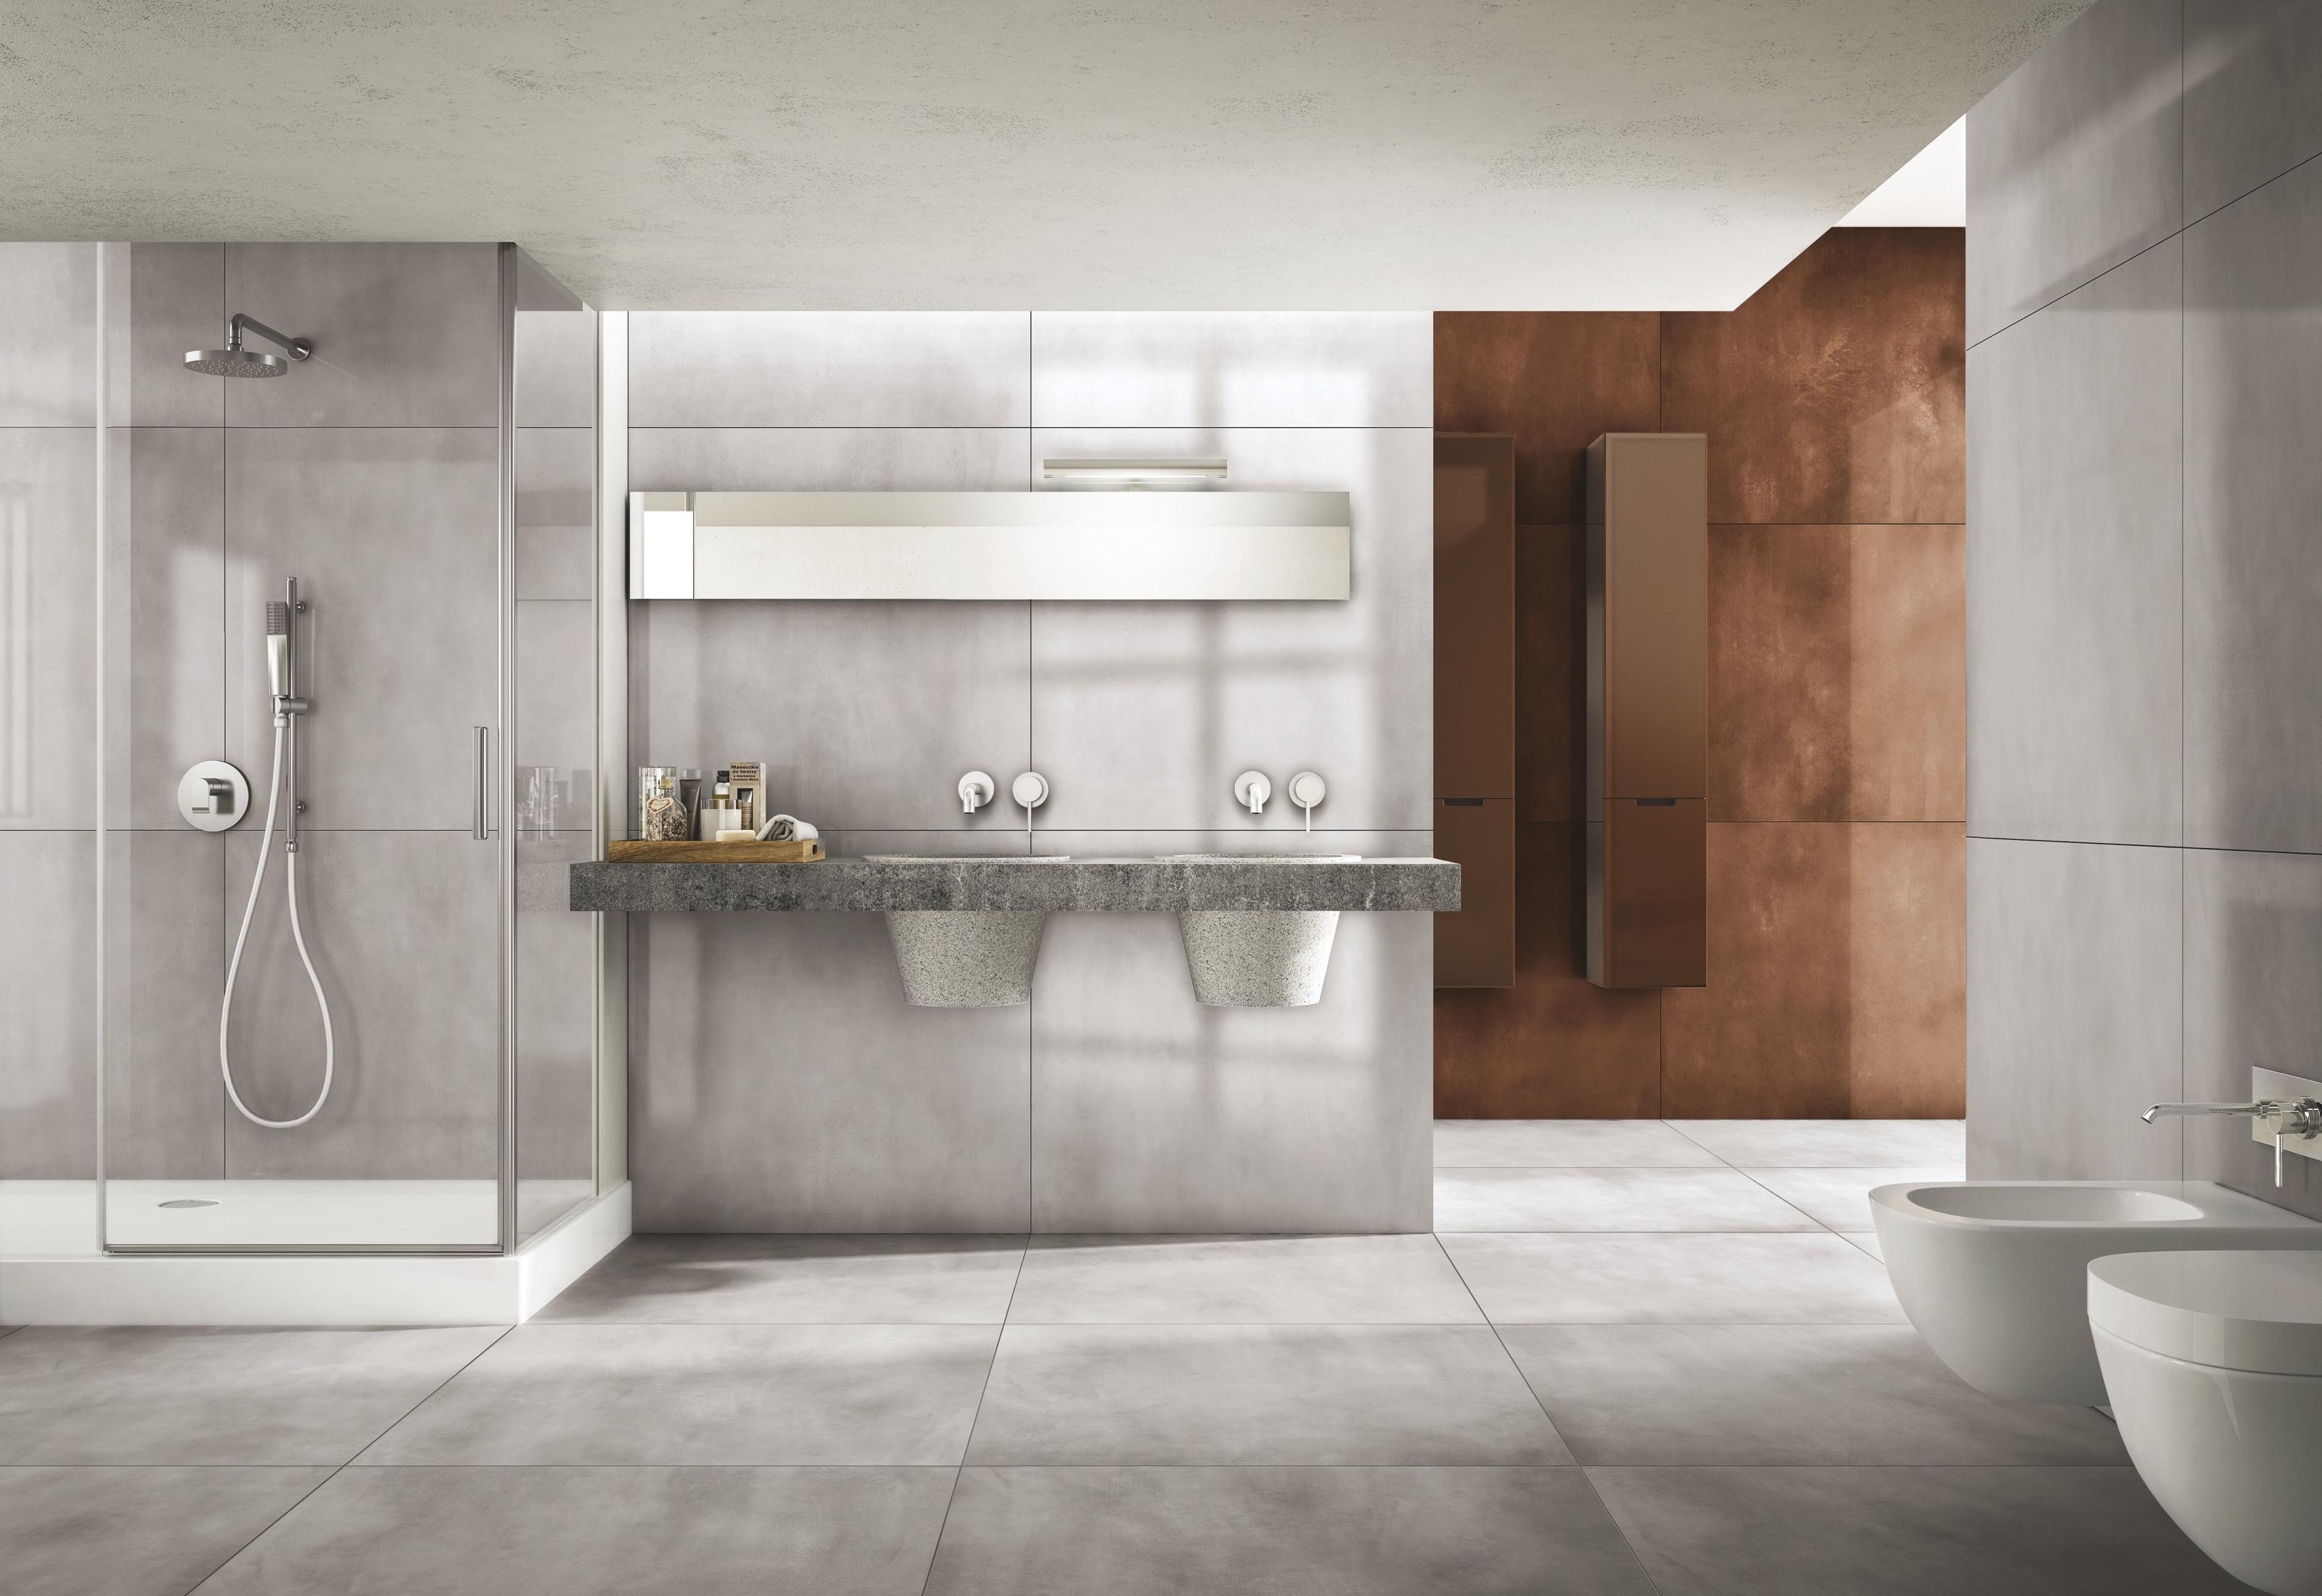 Design Bagno 2015 : Kbb award finalist for u bagno design luxury bathrooms